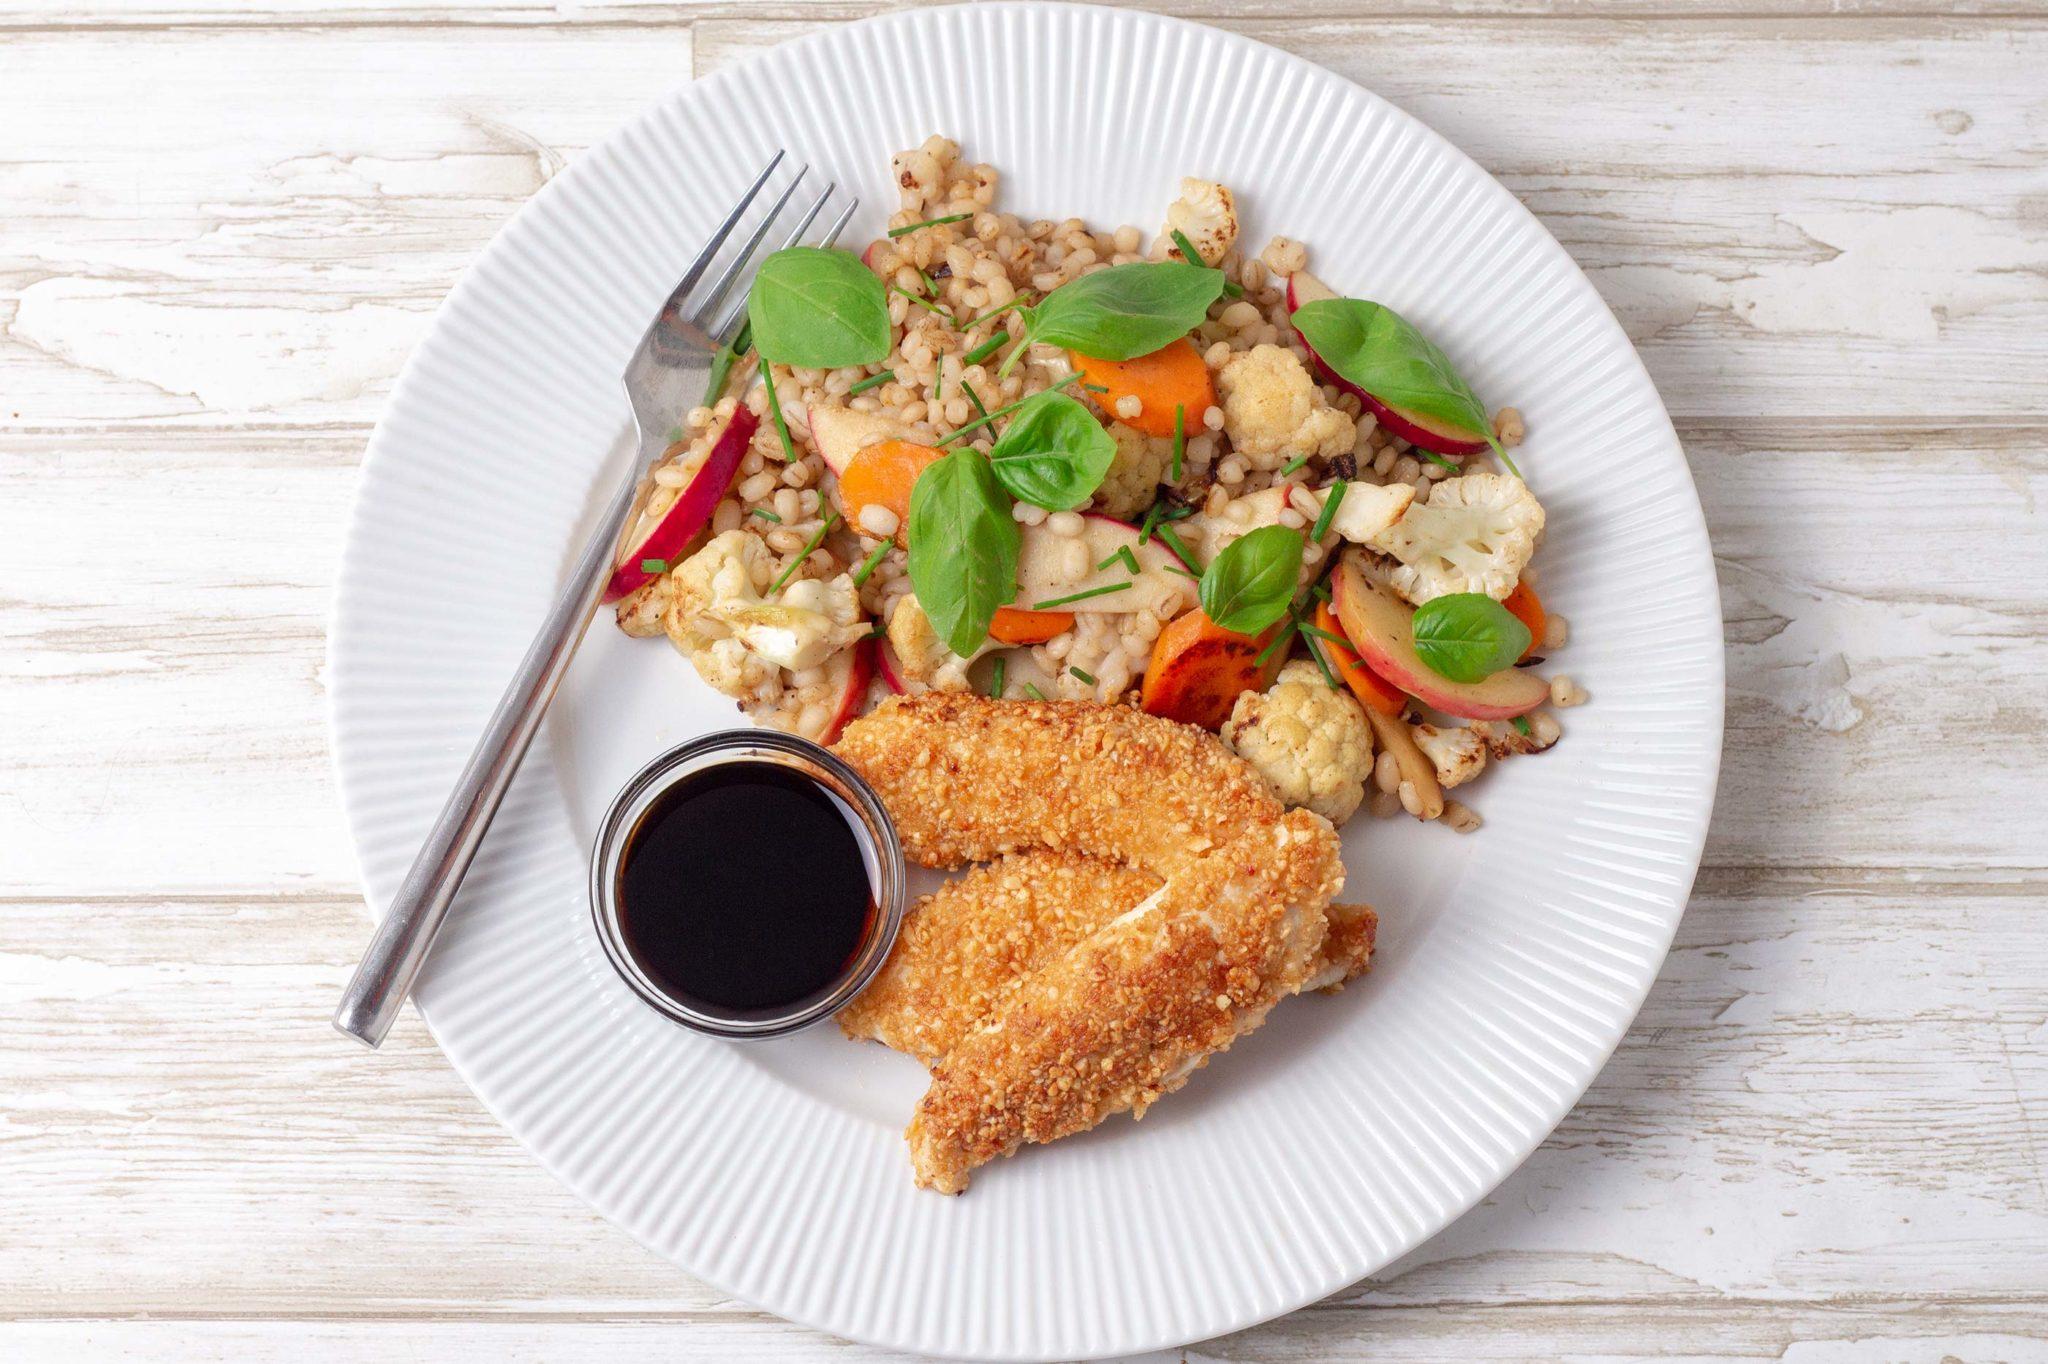 Peanutpaneret Kylling Med Stegte Ris Og Grøntsager